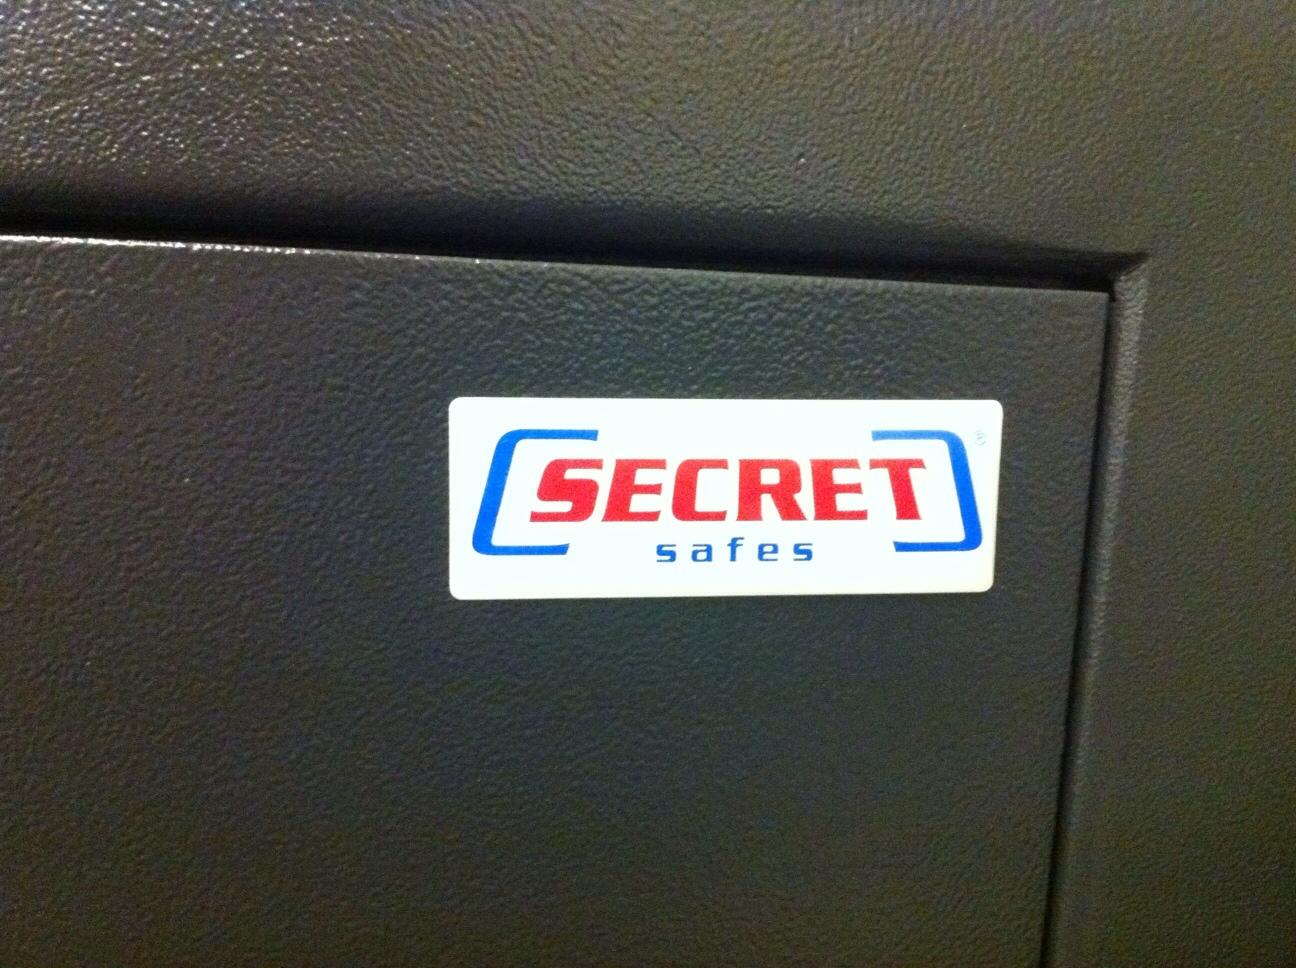 1935: Secret Safes